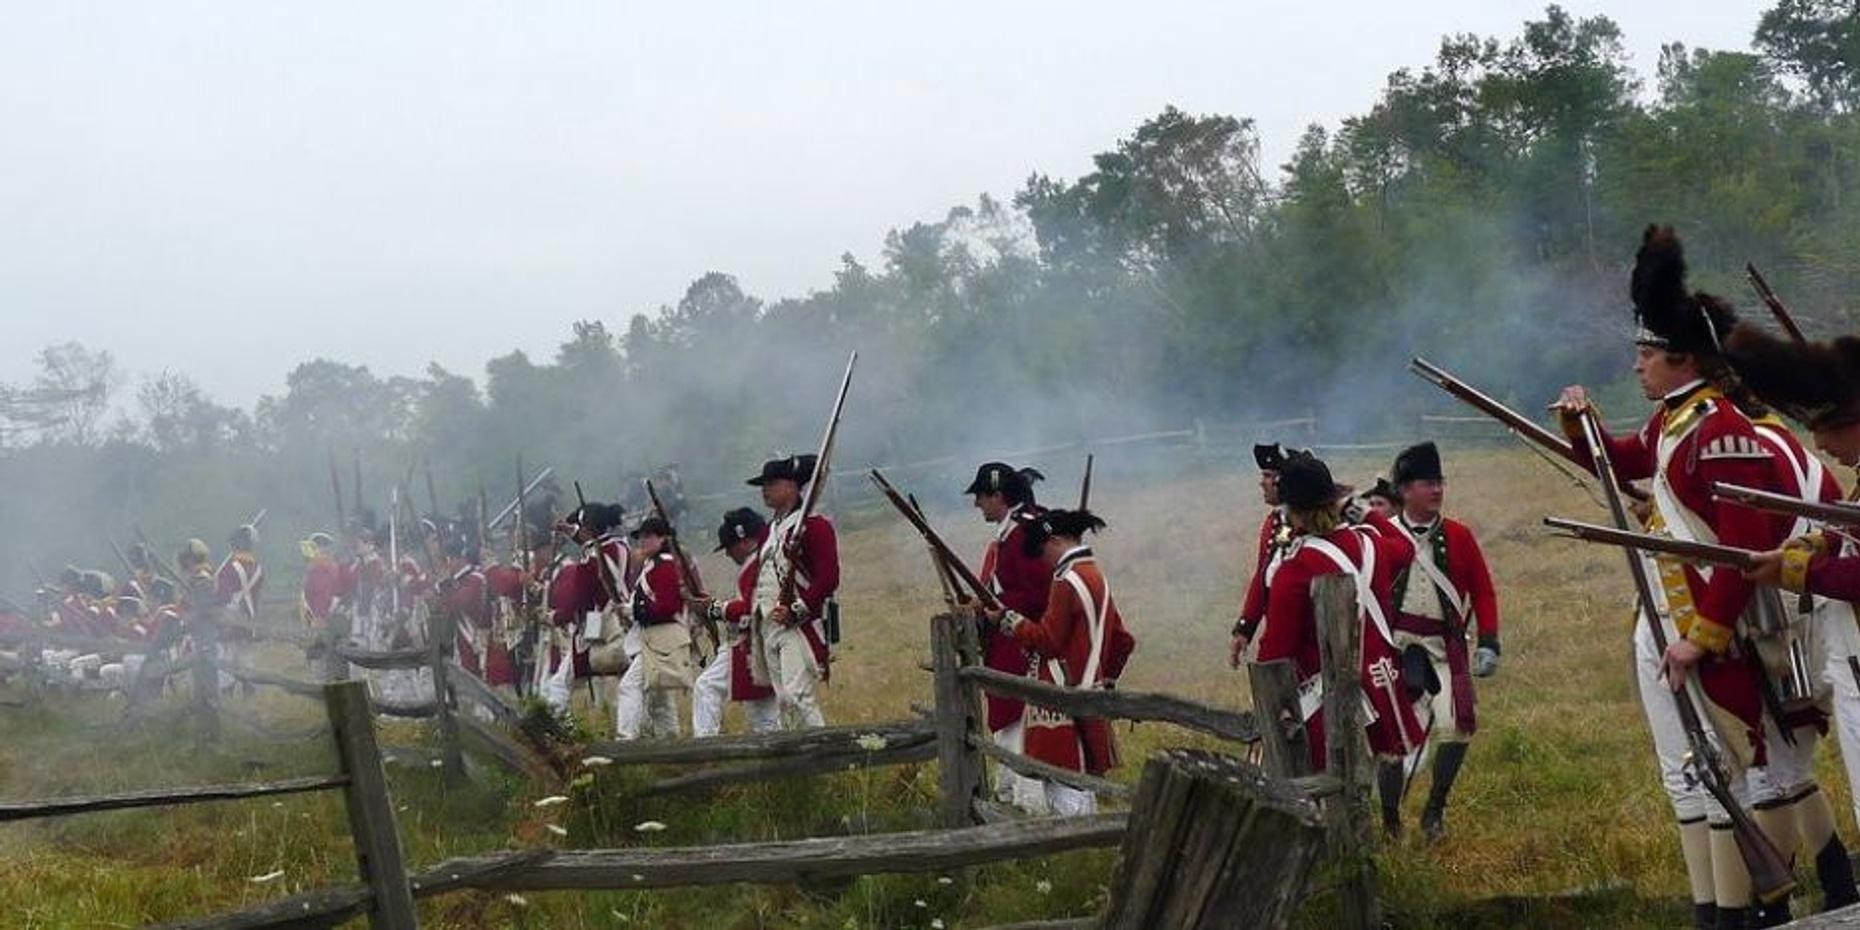 Revolutionary War Culper Spies Tour in NYC